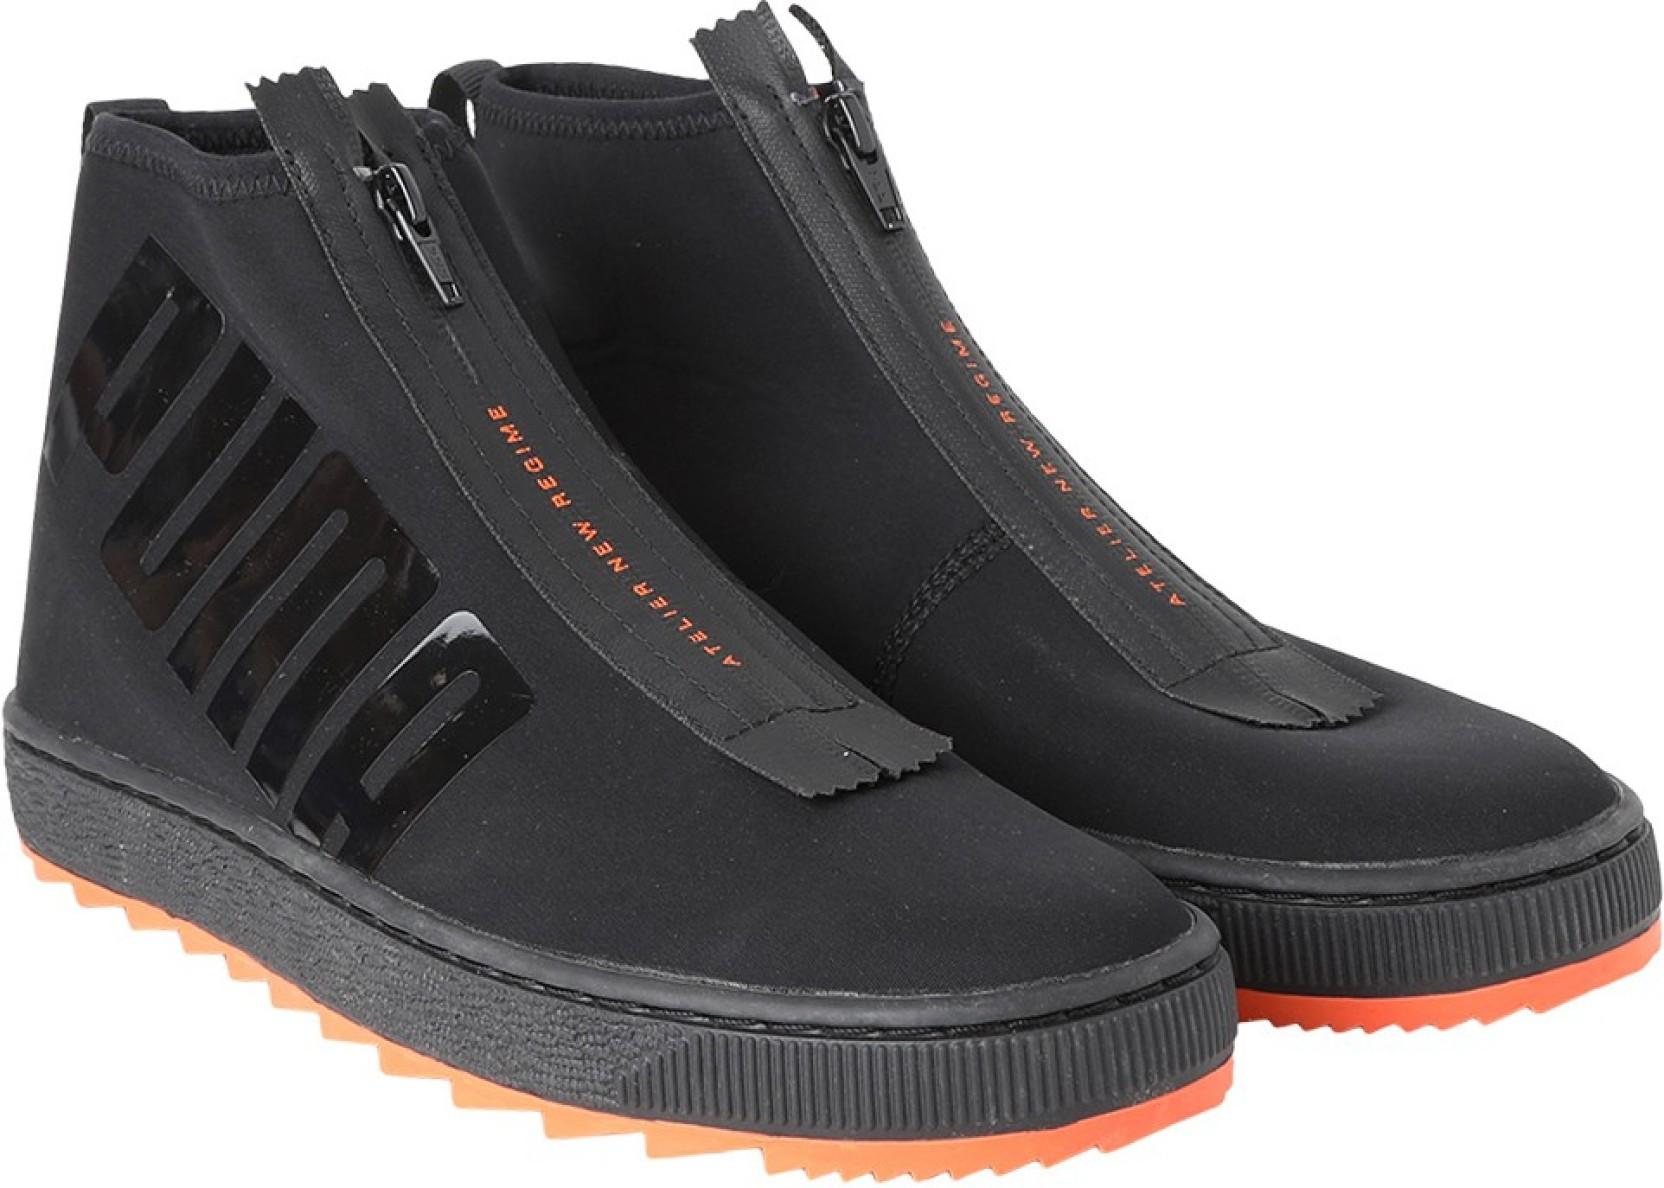 Puma Basket Boot ANR Sneakers For Men Buy Puma Basket Boot